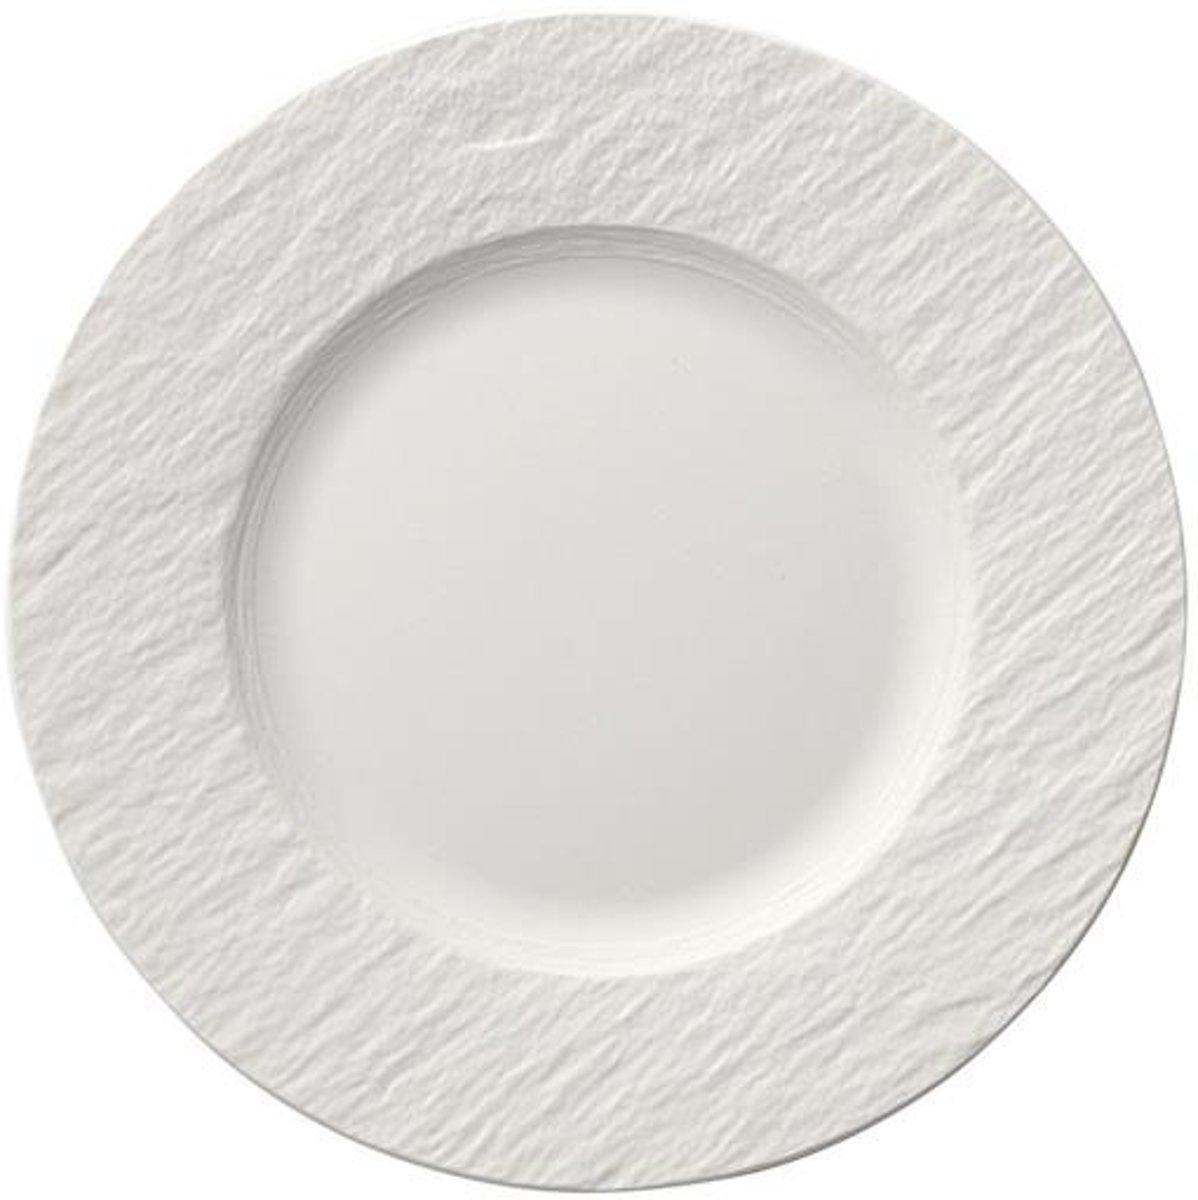 Villeroy & Boch - Manufacture Rock blanc Ontbijtbord